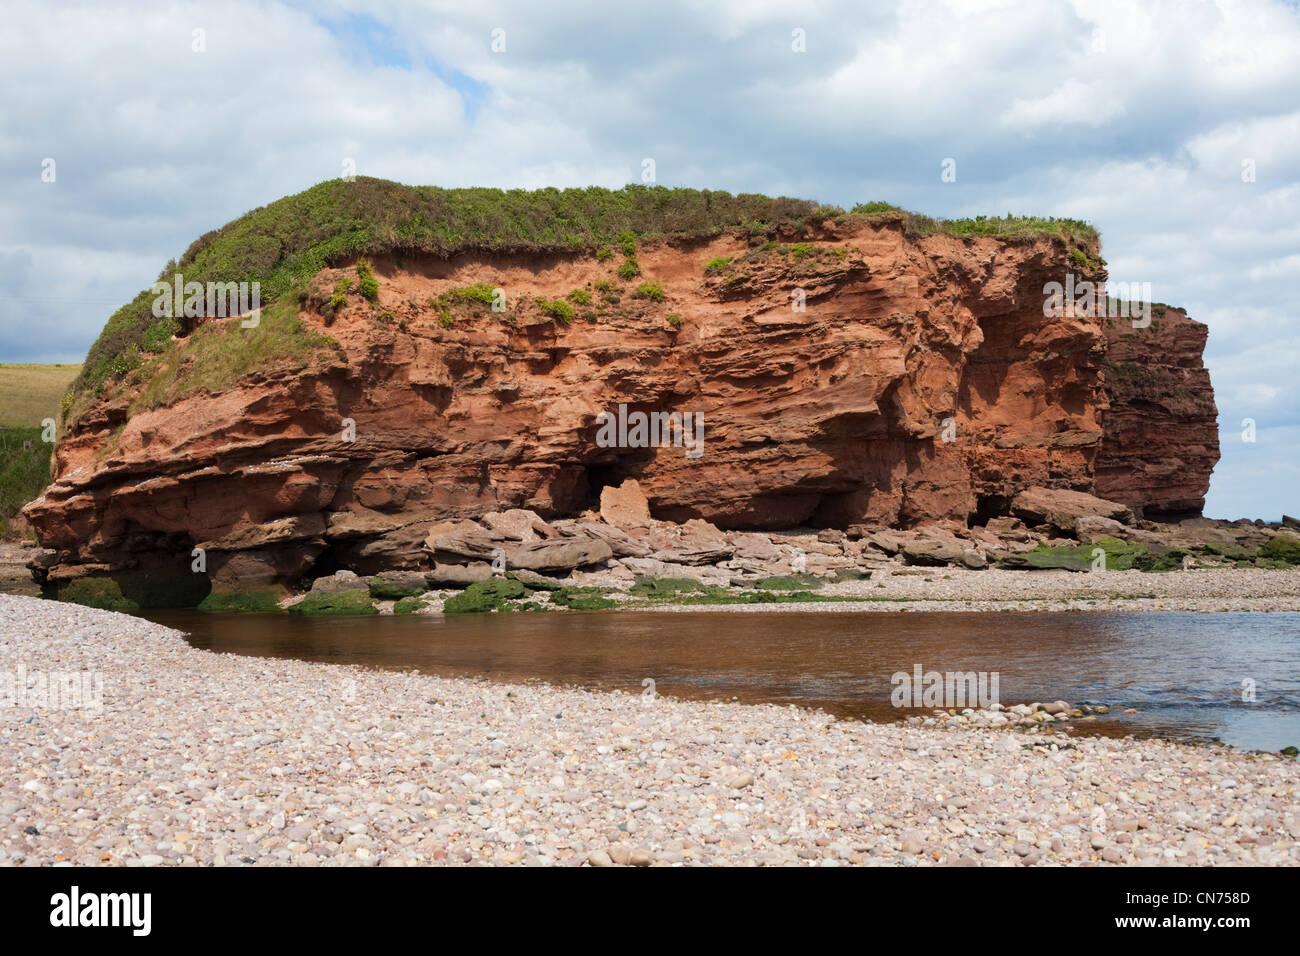 Sandstone rock formations at Otter Head, Budleigh Salterton, Devon, UK - Stock Image